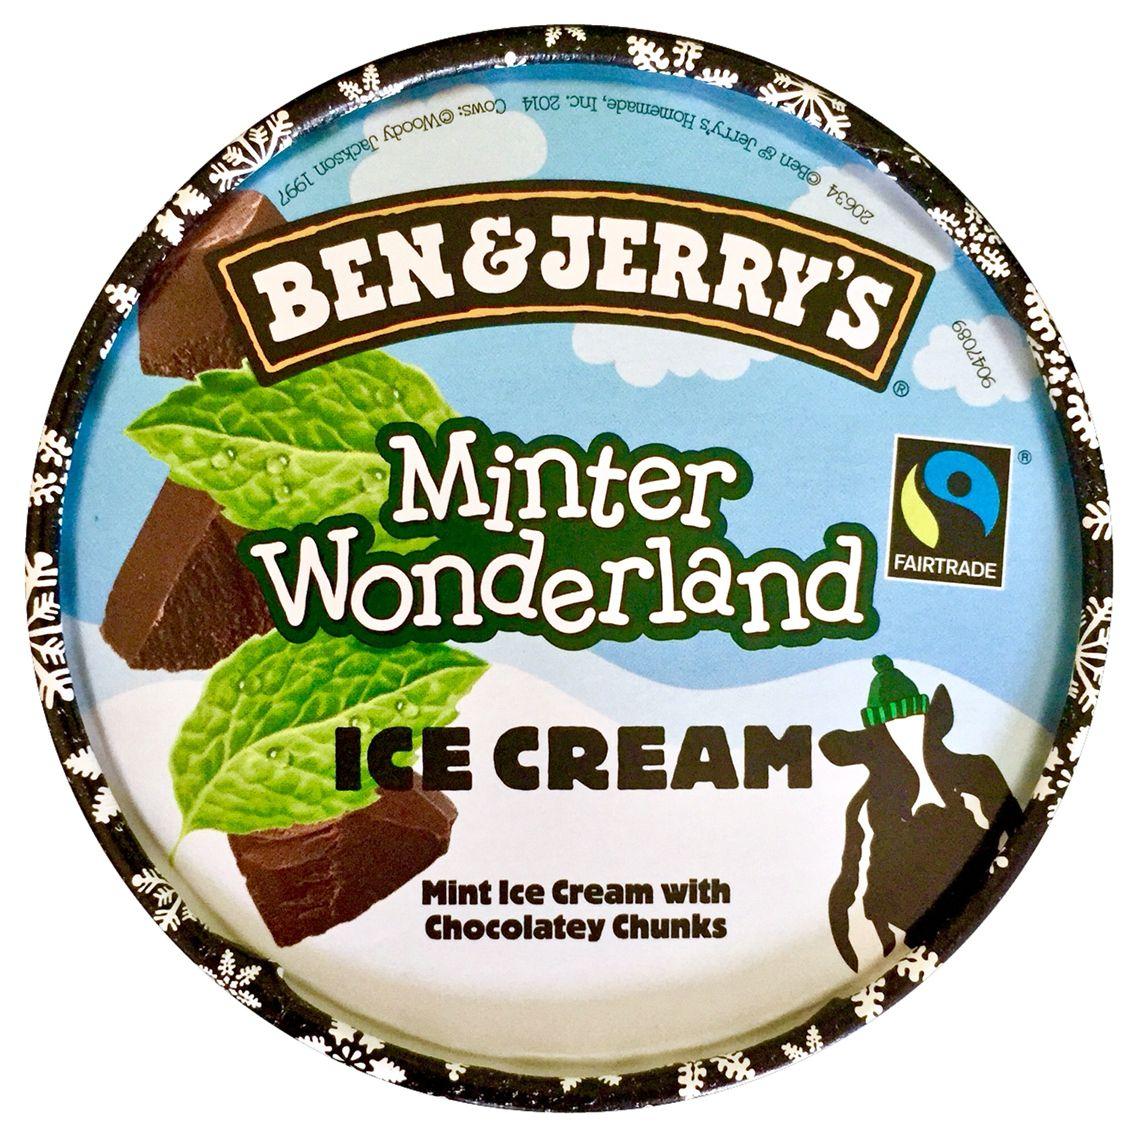 Ben and Jerry's Minter Wonderland ice cream £1.25 @ Co-operative